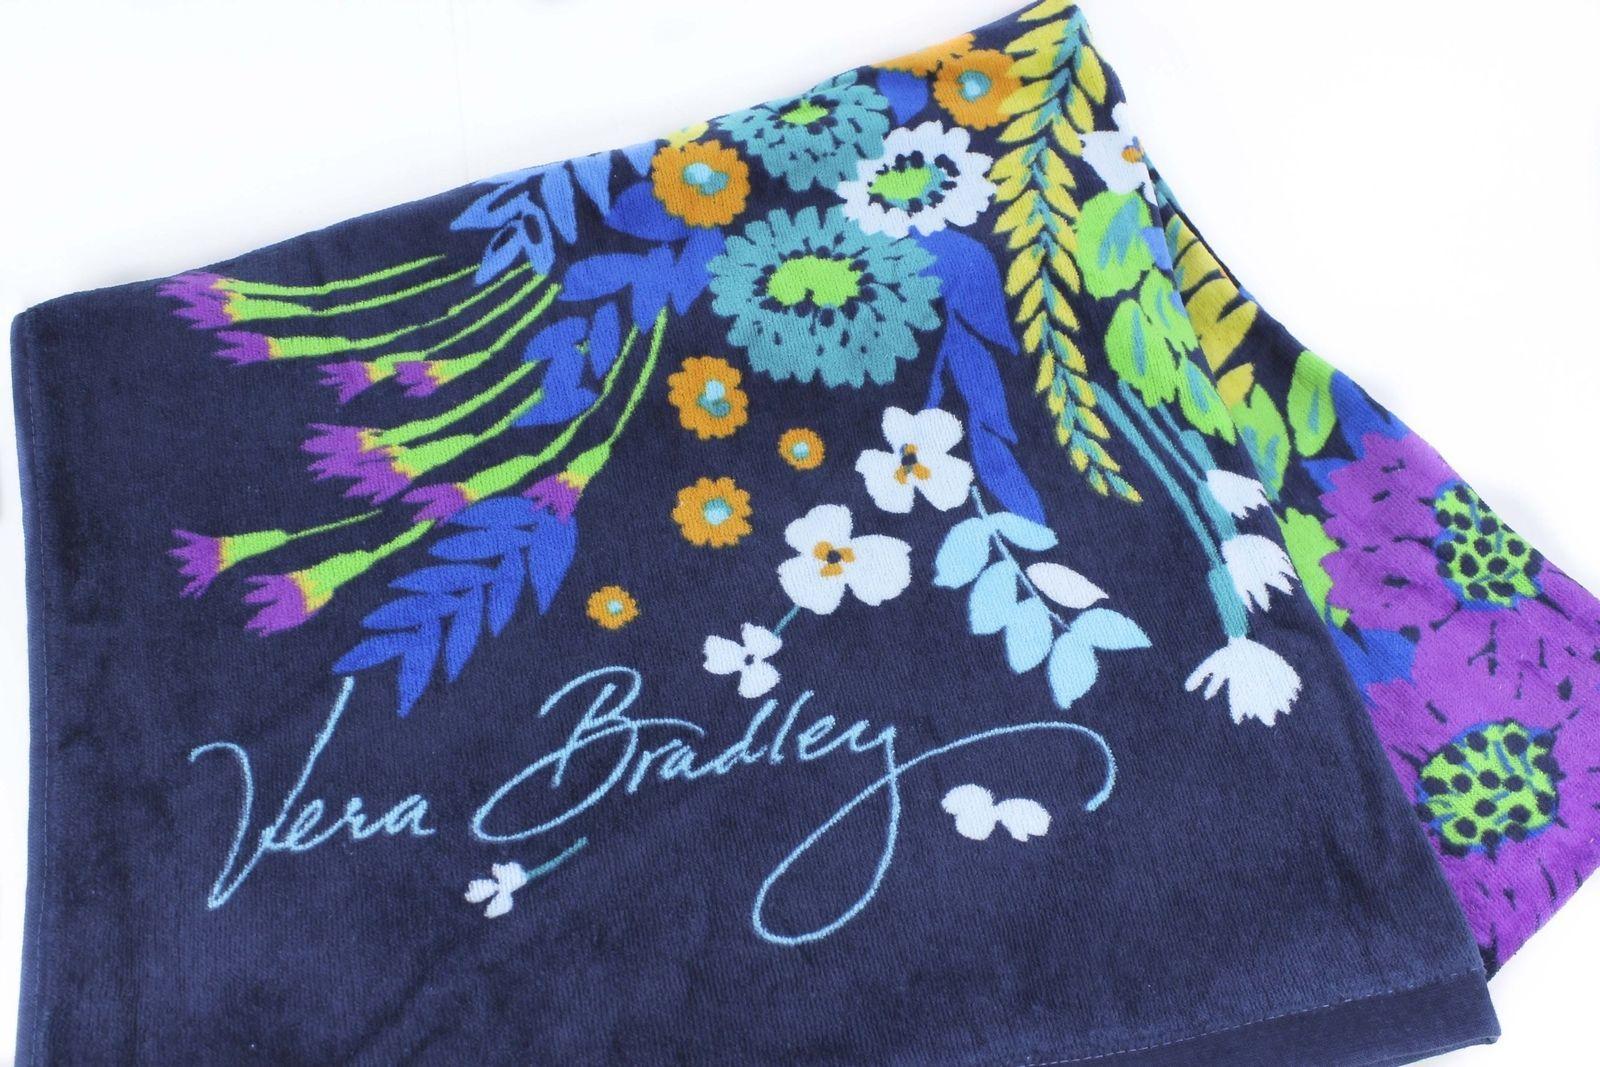 Vera Bradley Beach Towel Midnight Blues NWT Retired Pattern